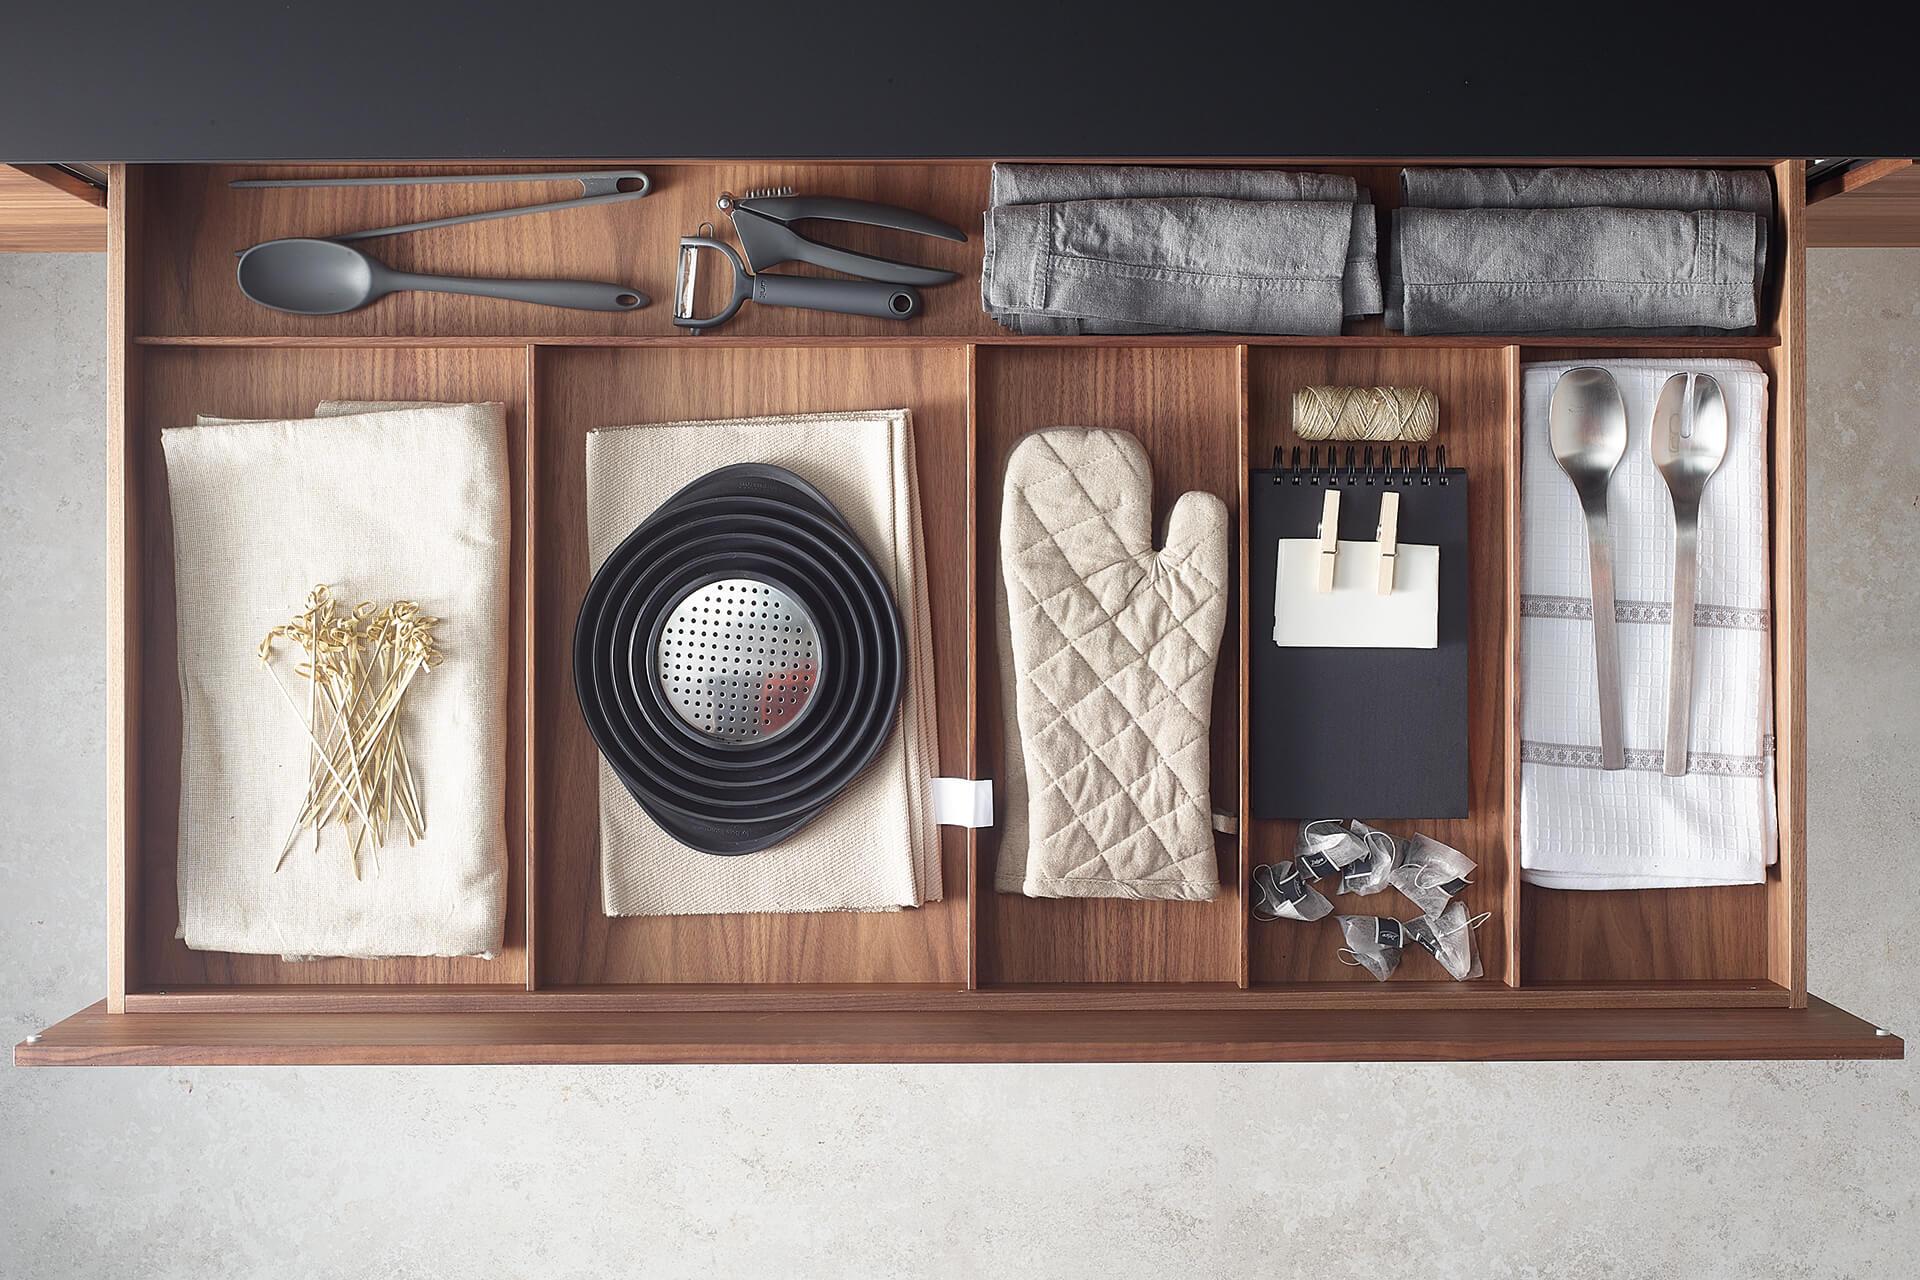 accesorios-cajon-panos-y-utiles-cocinas-santos